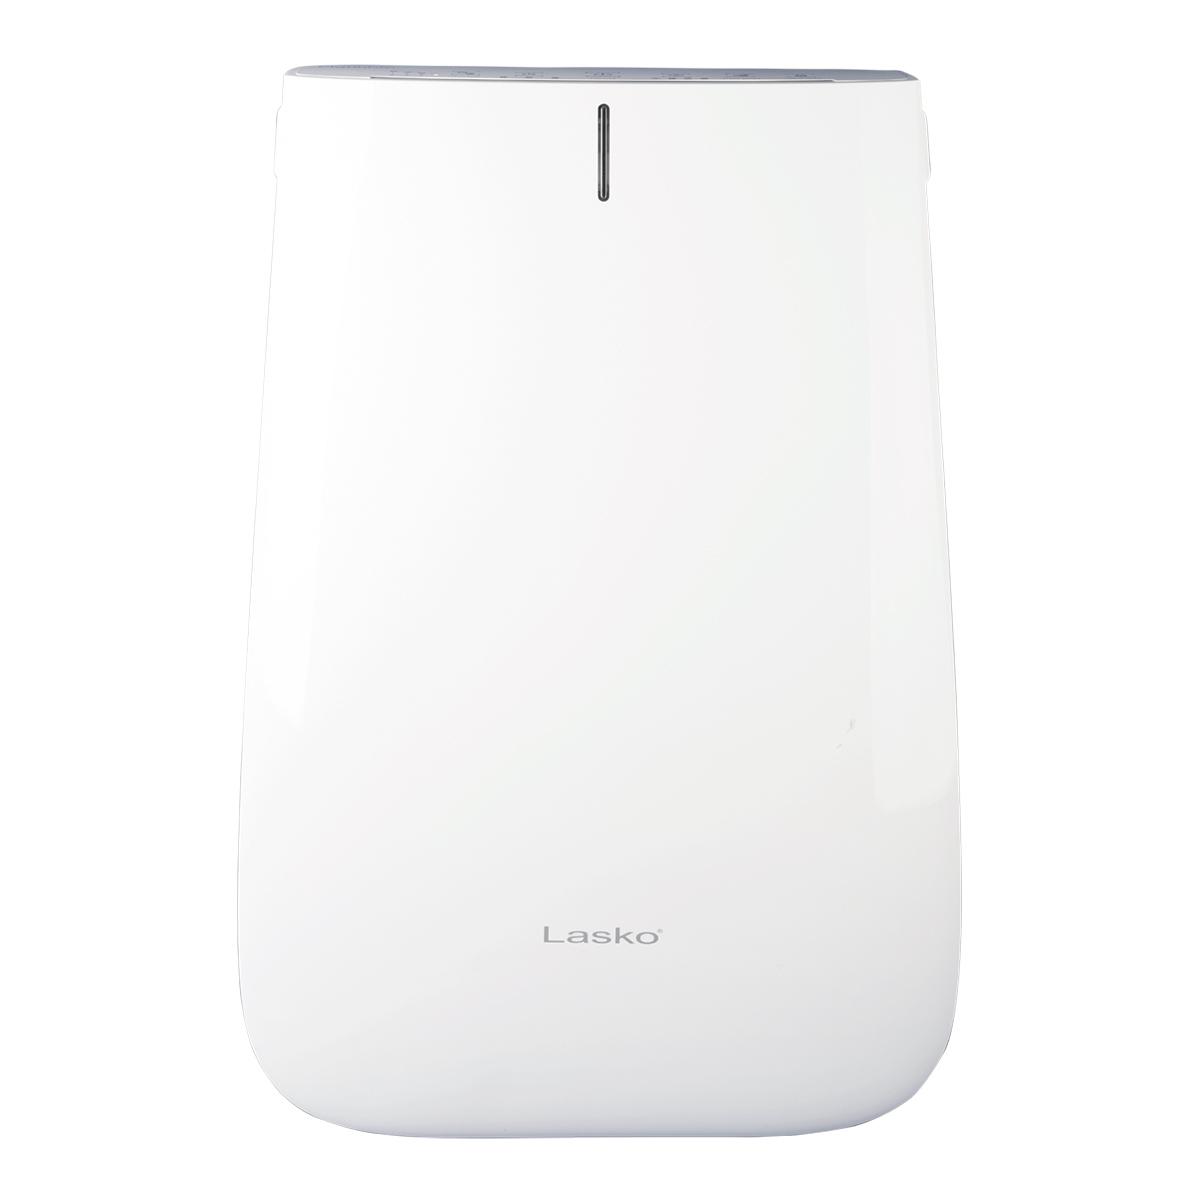 Lasko 壁掛式空氣清淨機 (HF-25640TW)